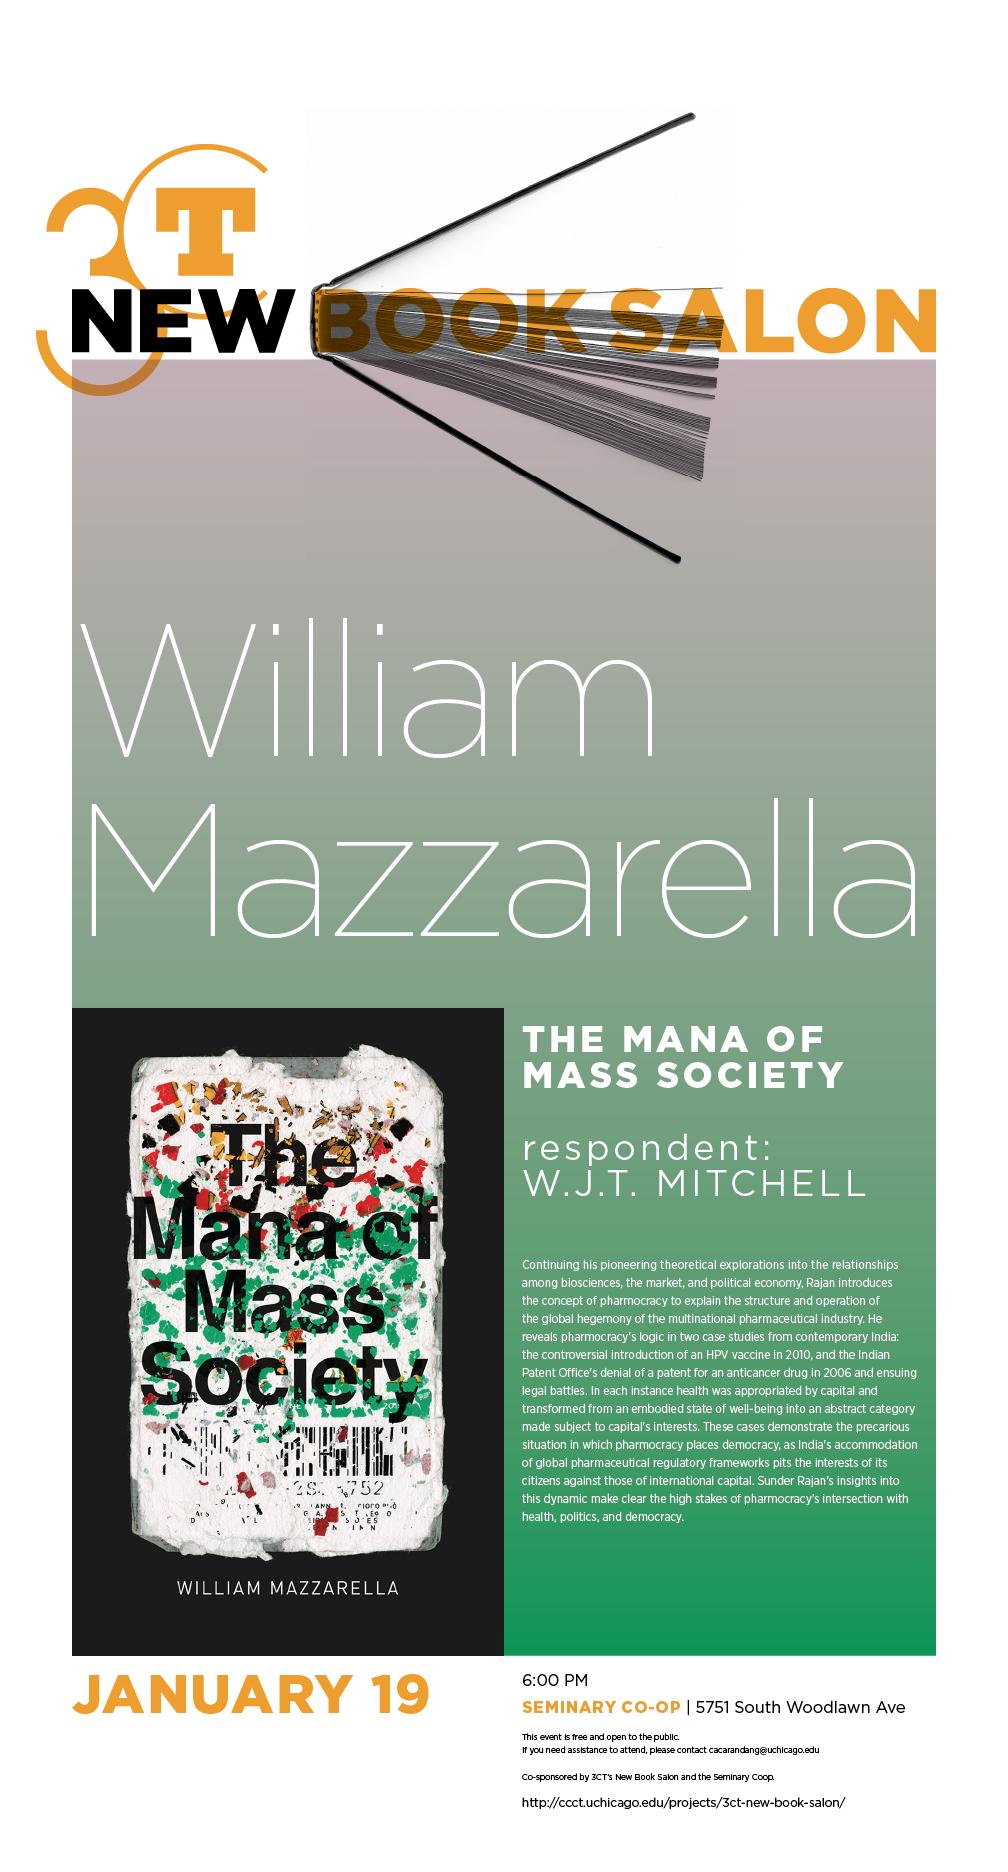 William Mazzarella New Book Salon poster, The Mana of Mass Society